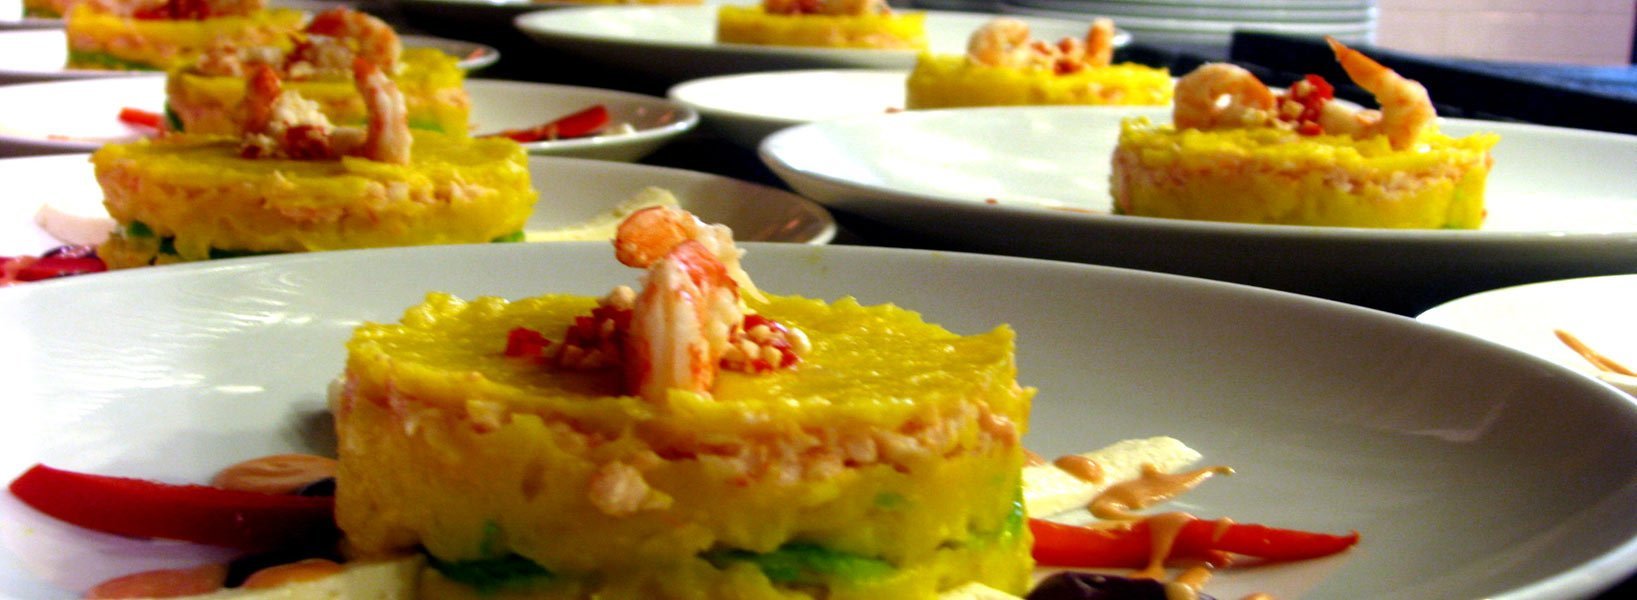 cucina peruviana, Perù - Blog Earth Viaggi, blog Earth Viaggi